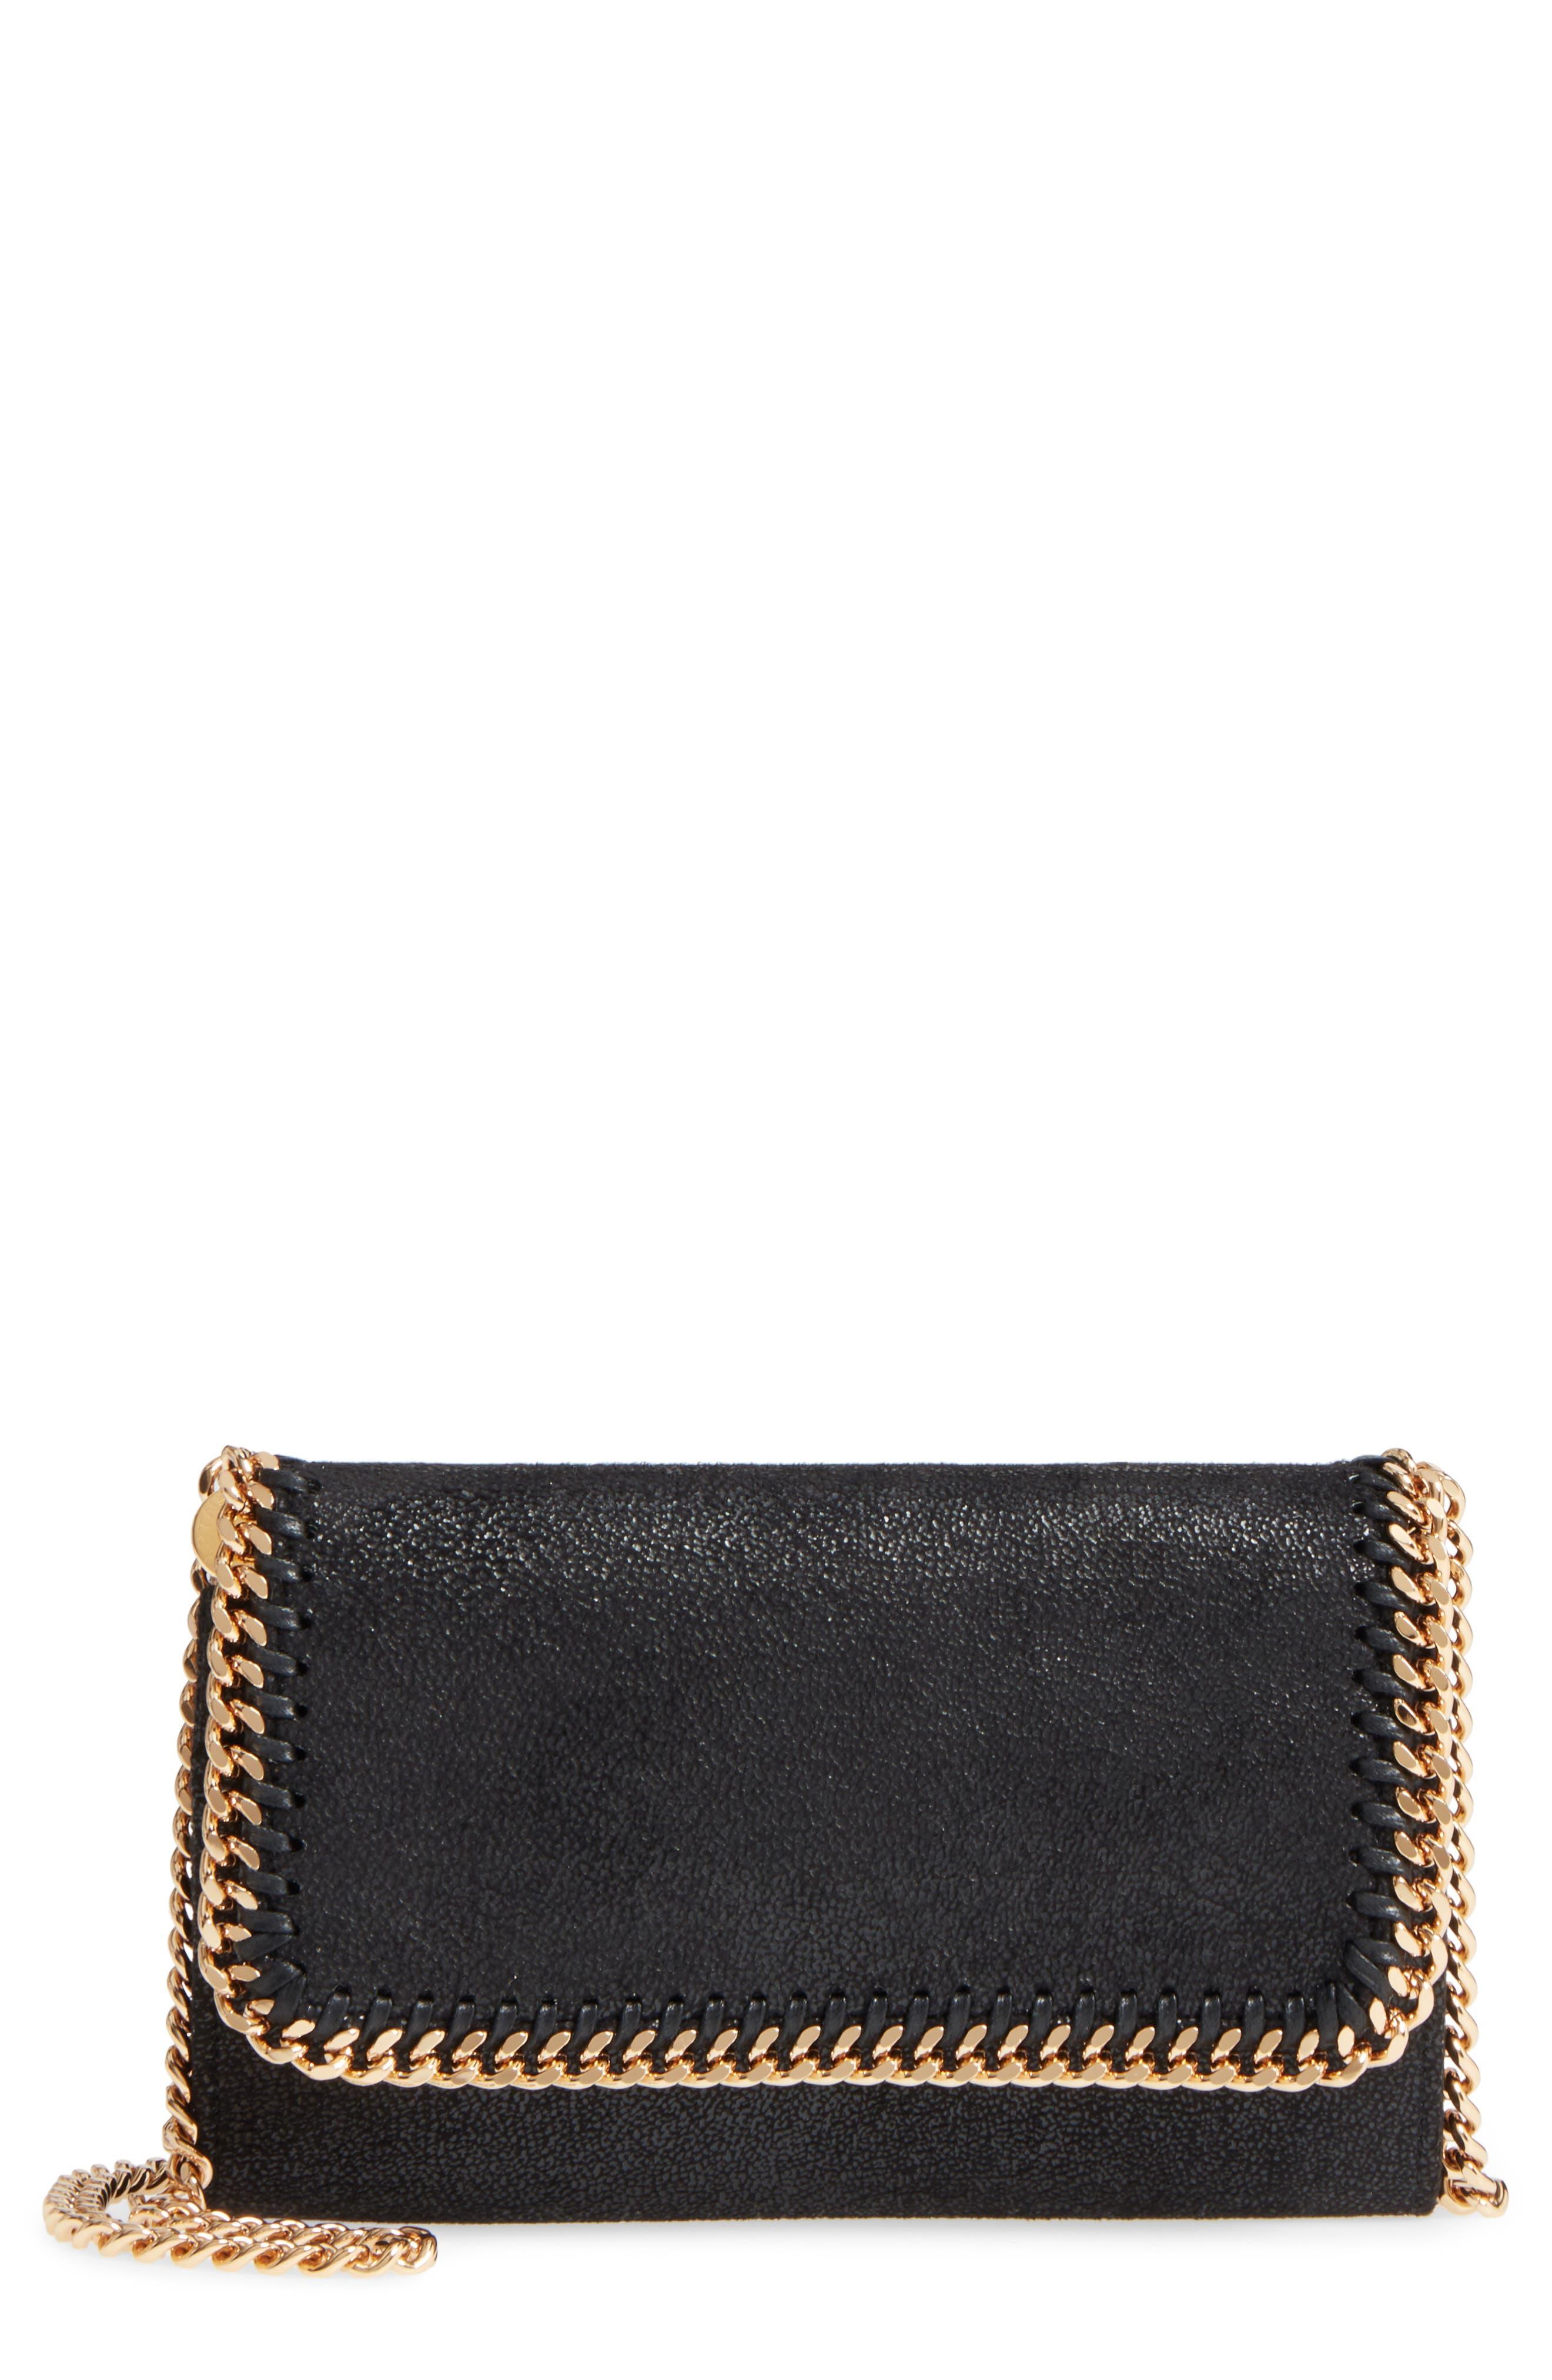 Shaggy Deer Faux Leather Crossbody Bag,                         Main,                         color, BLACK